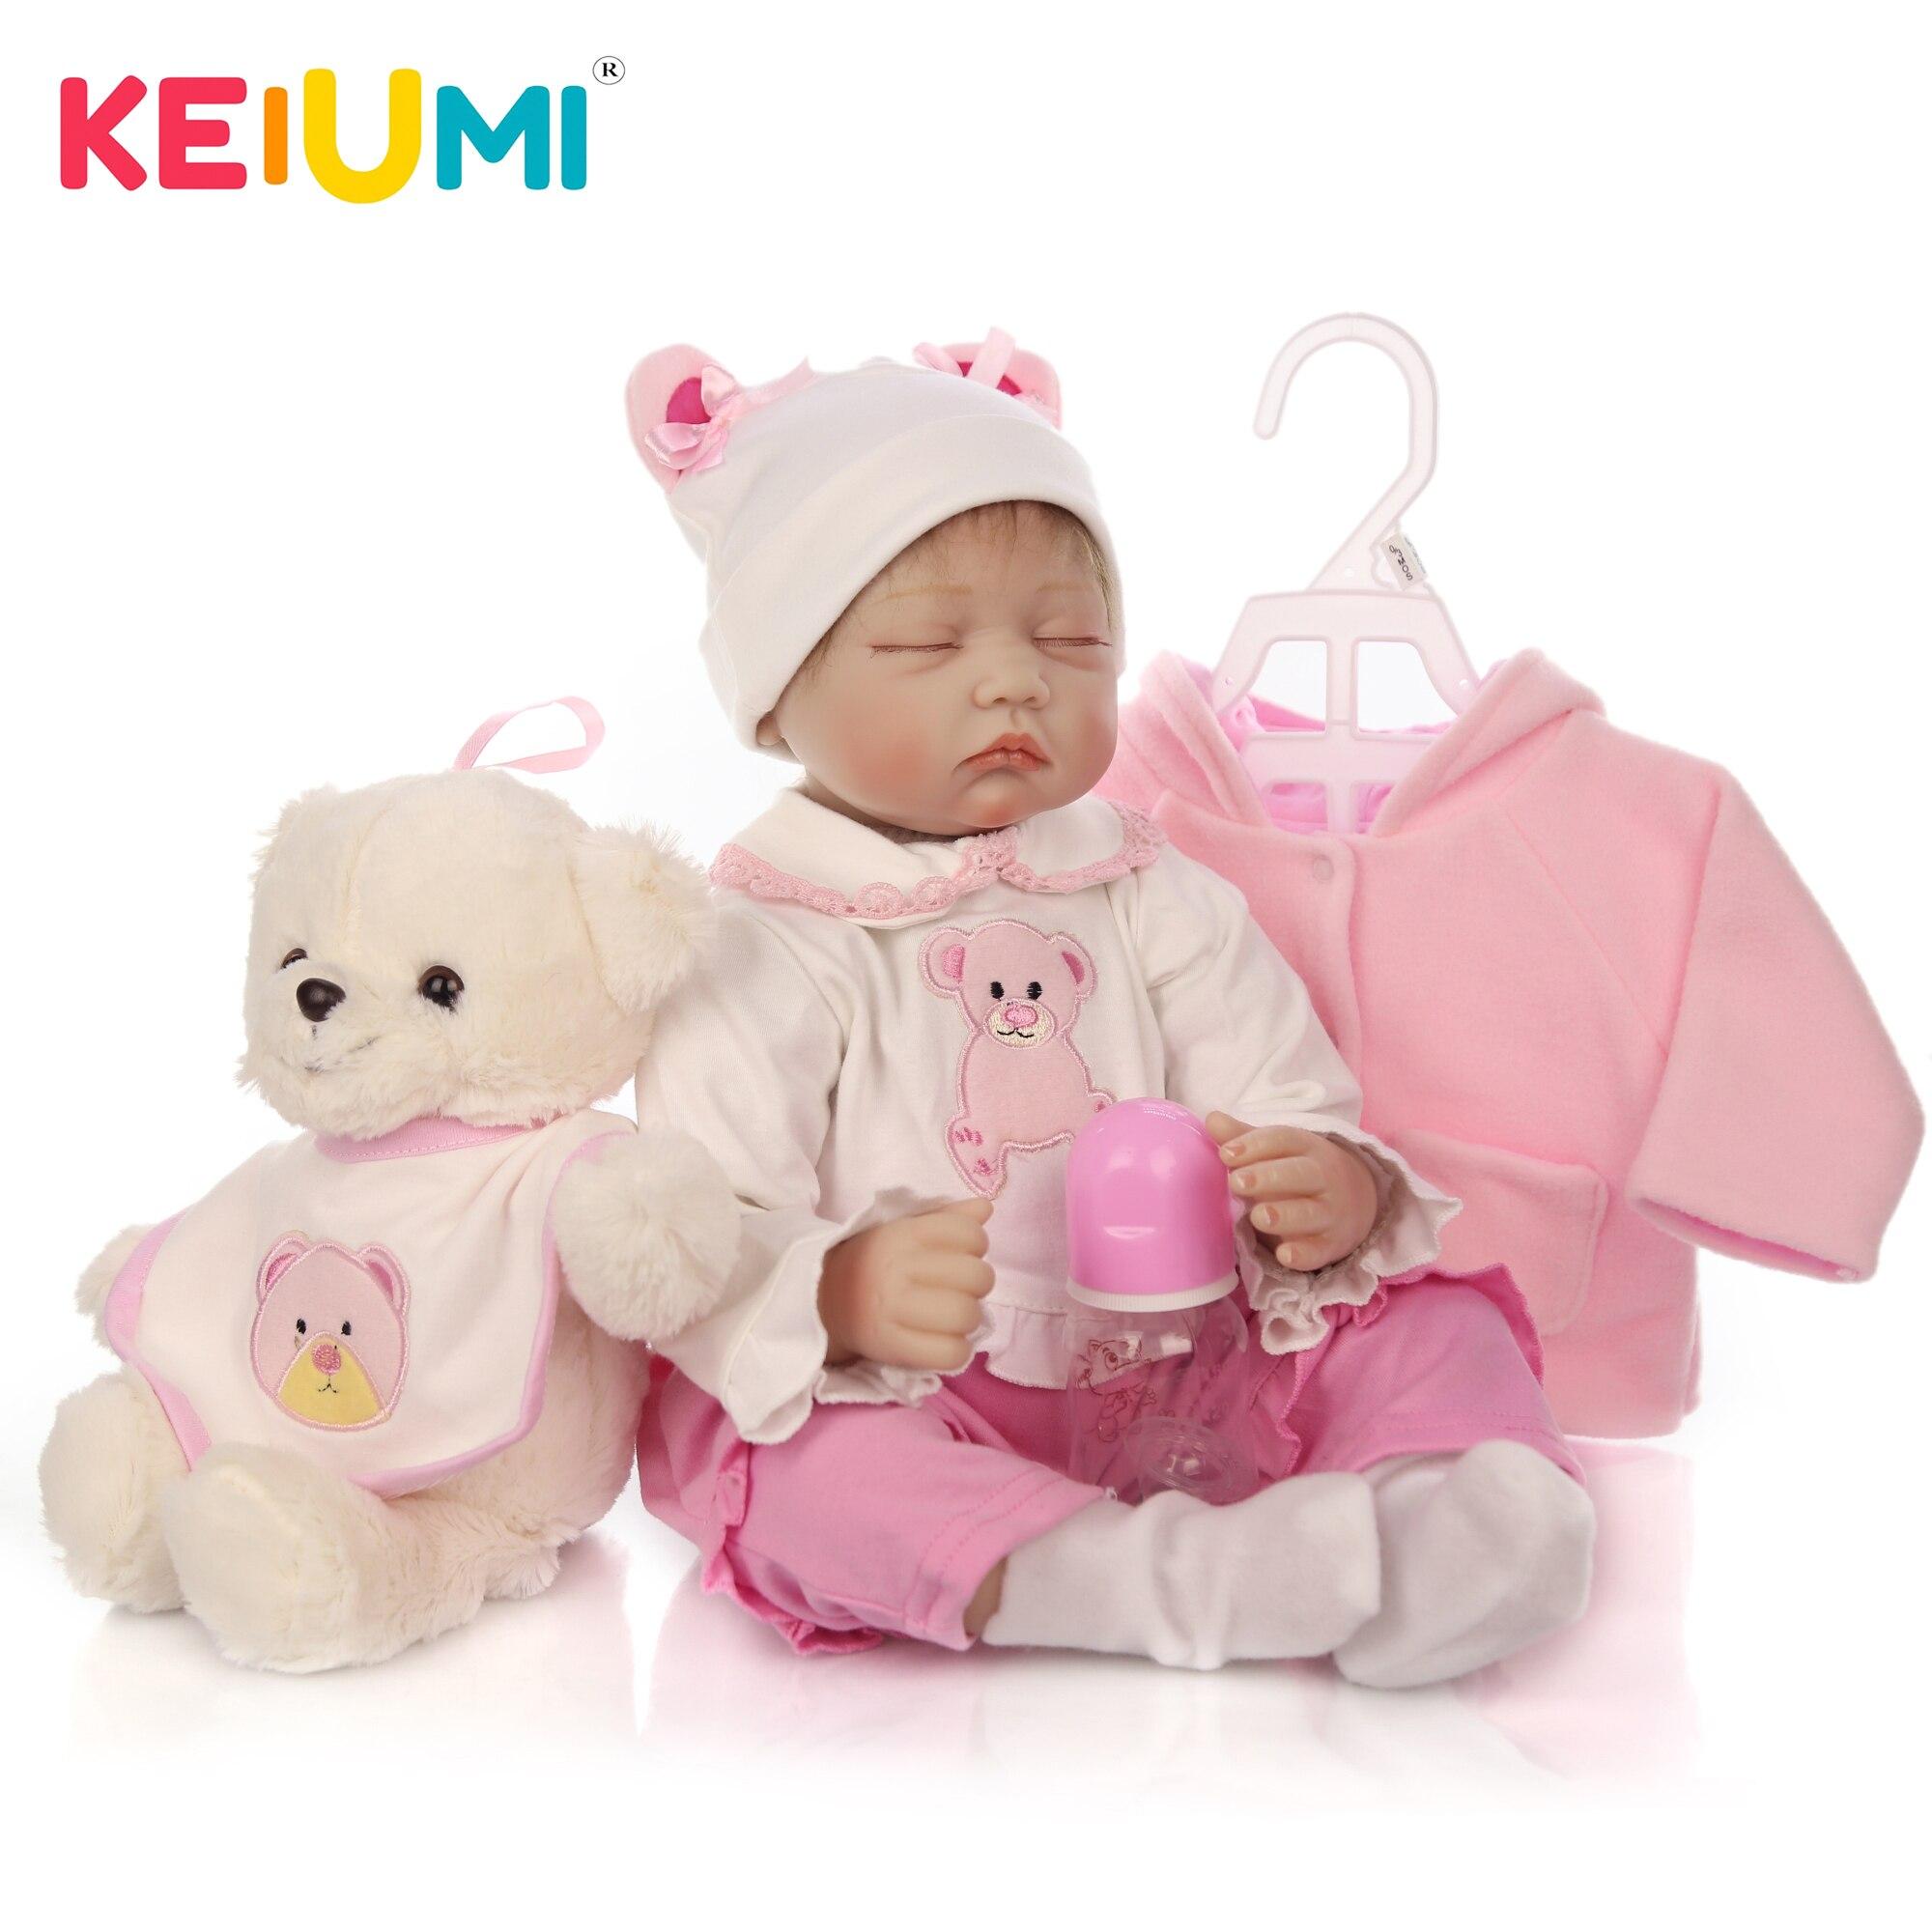 Cute Reborn Doll Soft Silicone 22